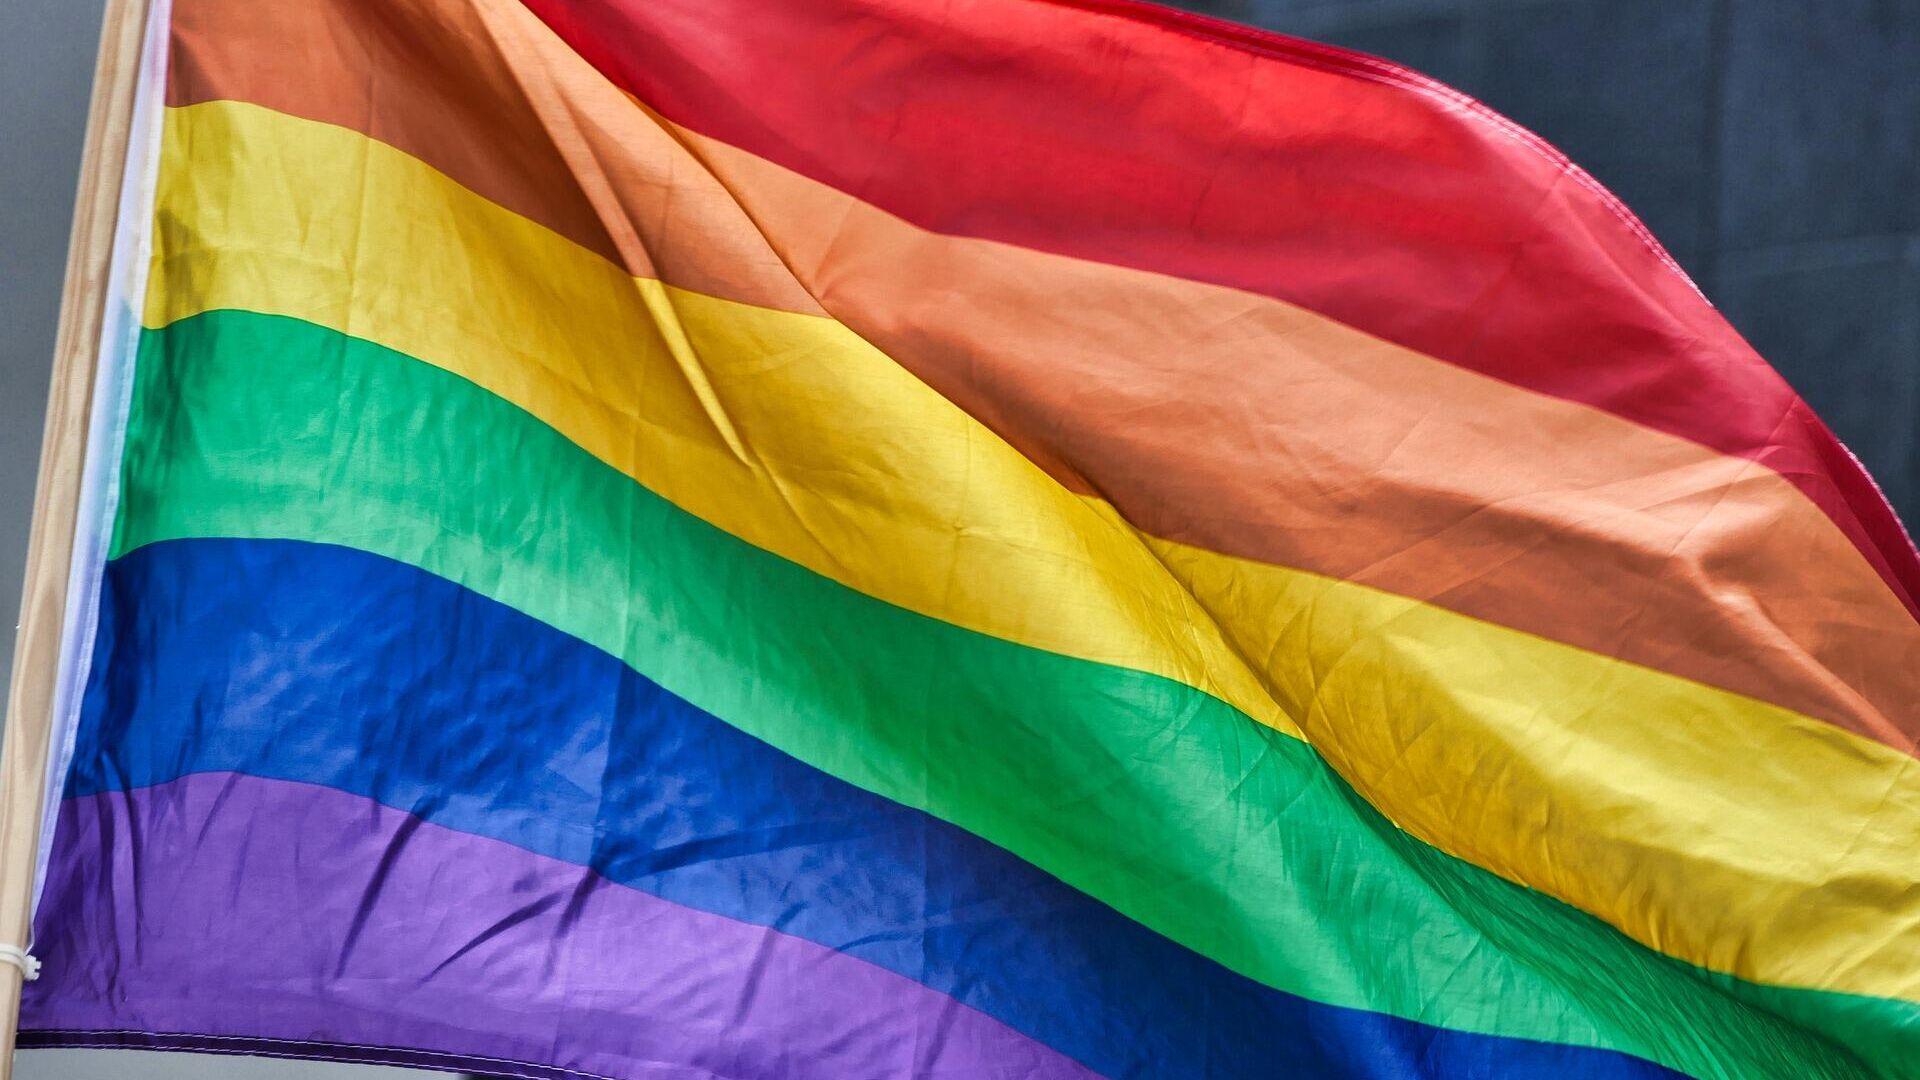 LGBT-Flagge (Symbolbild) - SNA, 1920, 13.08.2021